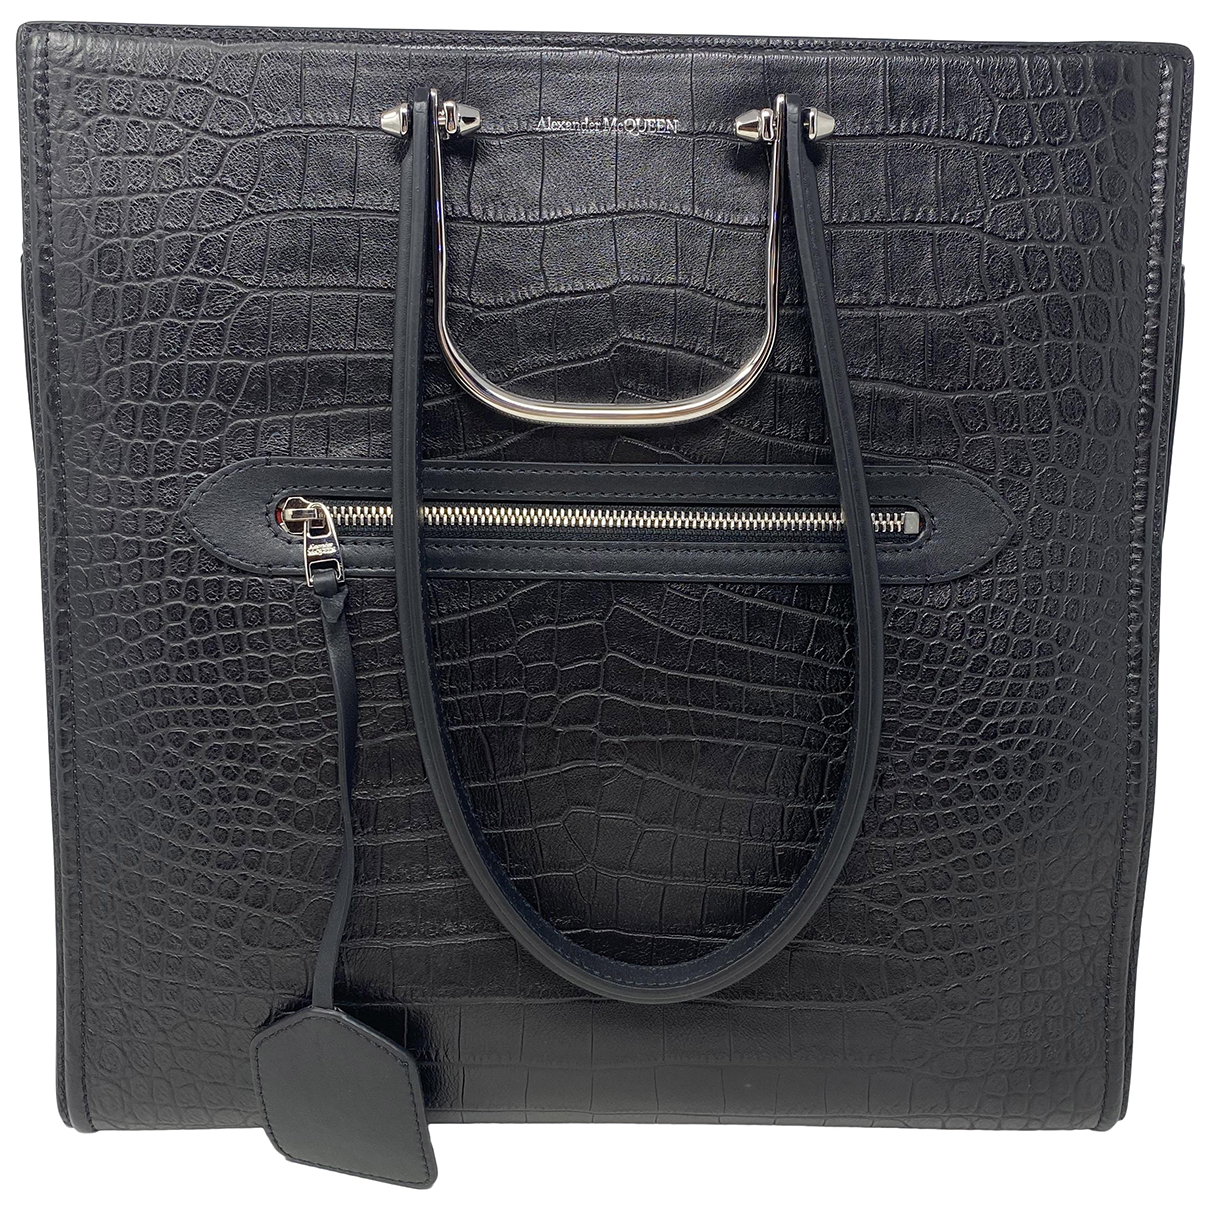 Alexander Mcqueen N Black Leather handbag for Women N